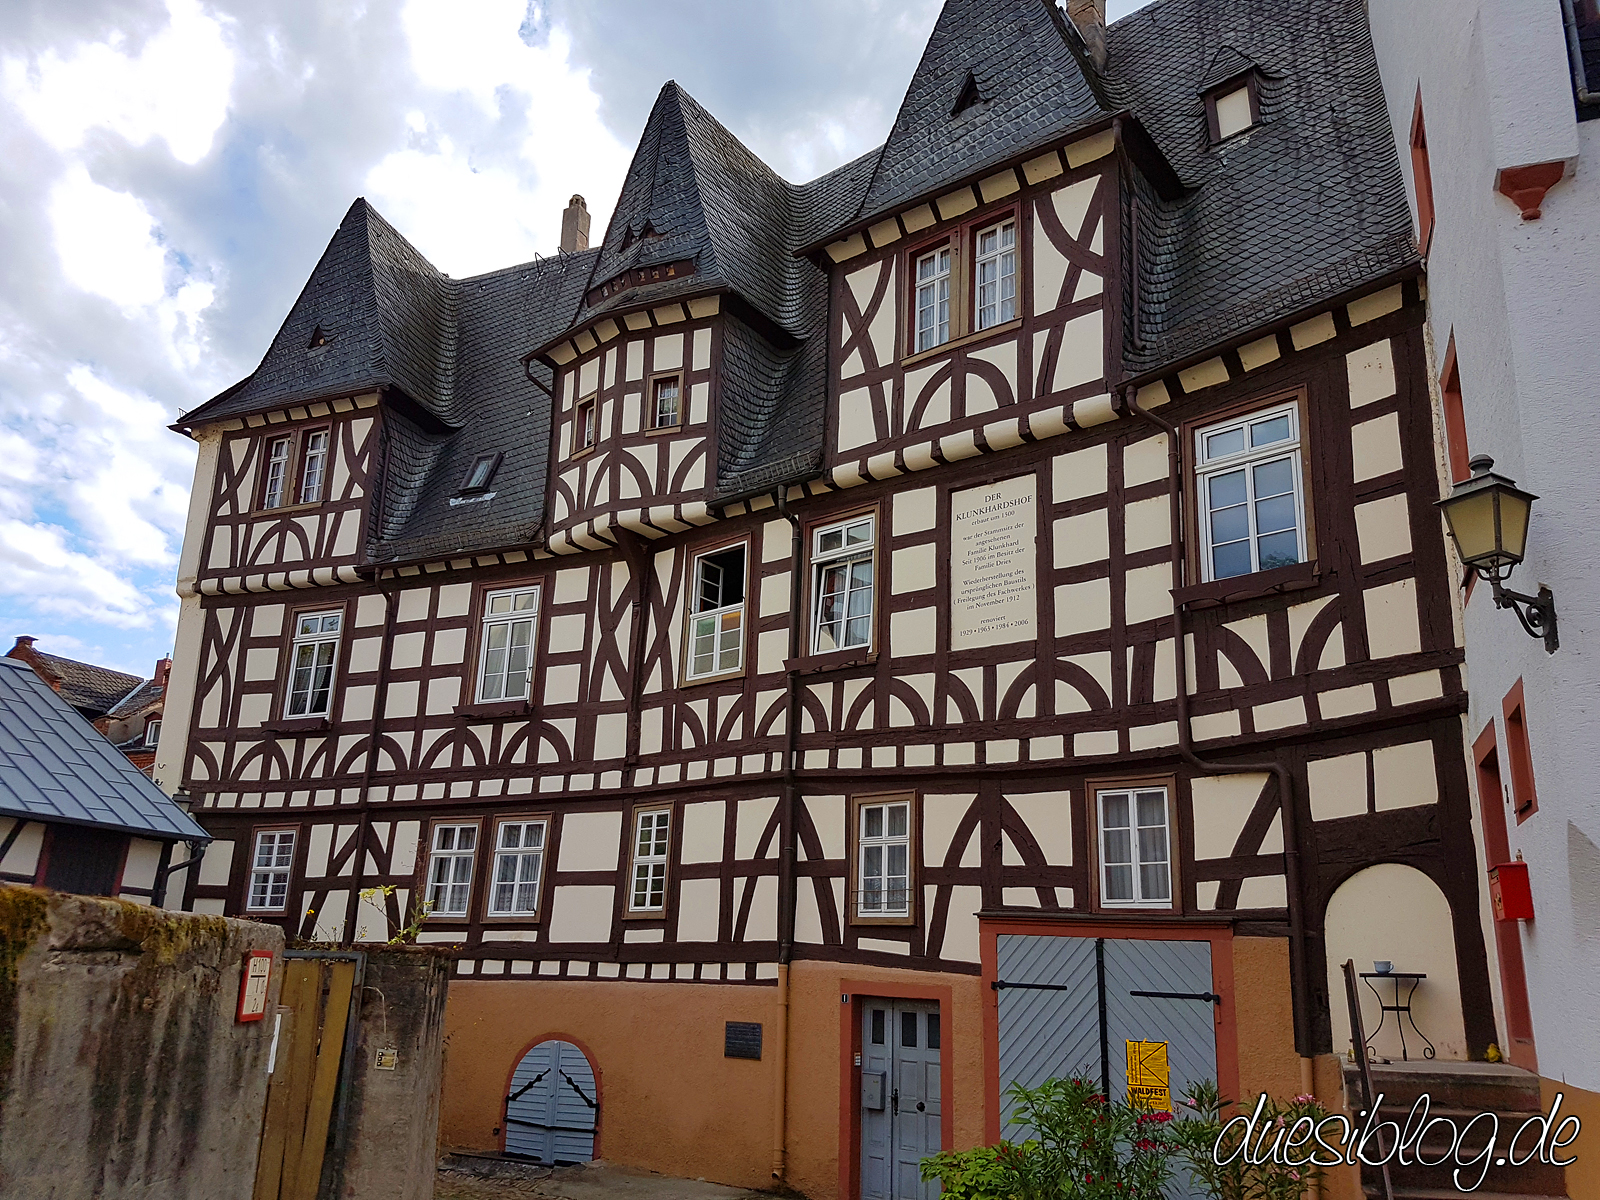 Ruedesheim Rheingau Travelblog duesiblog 034